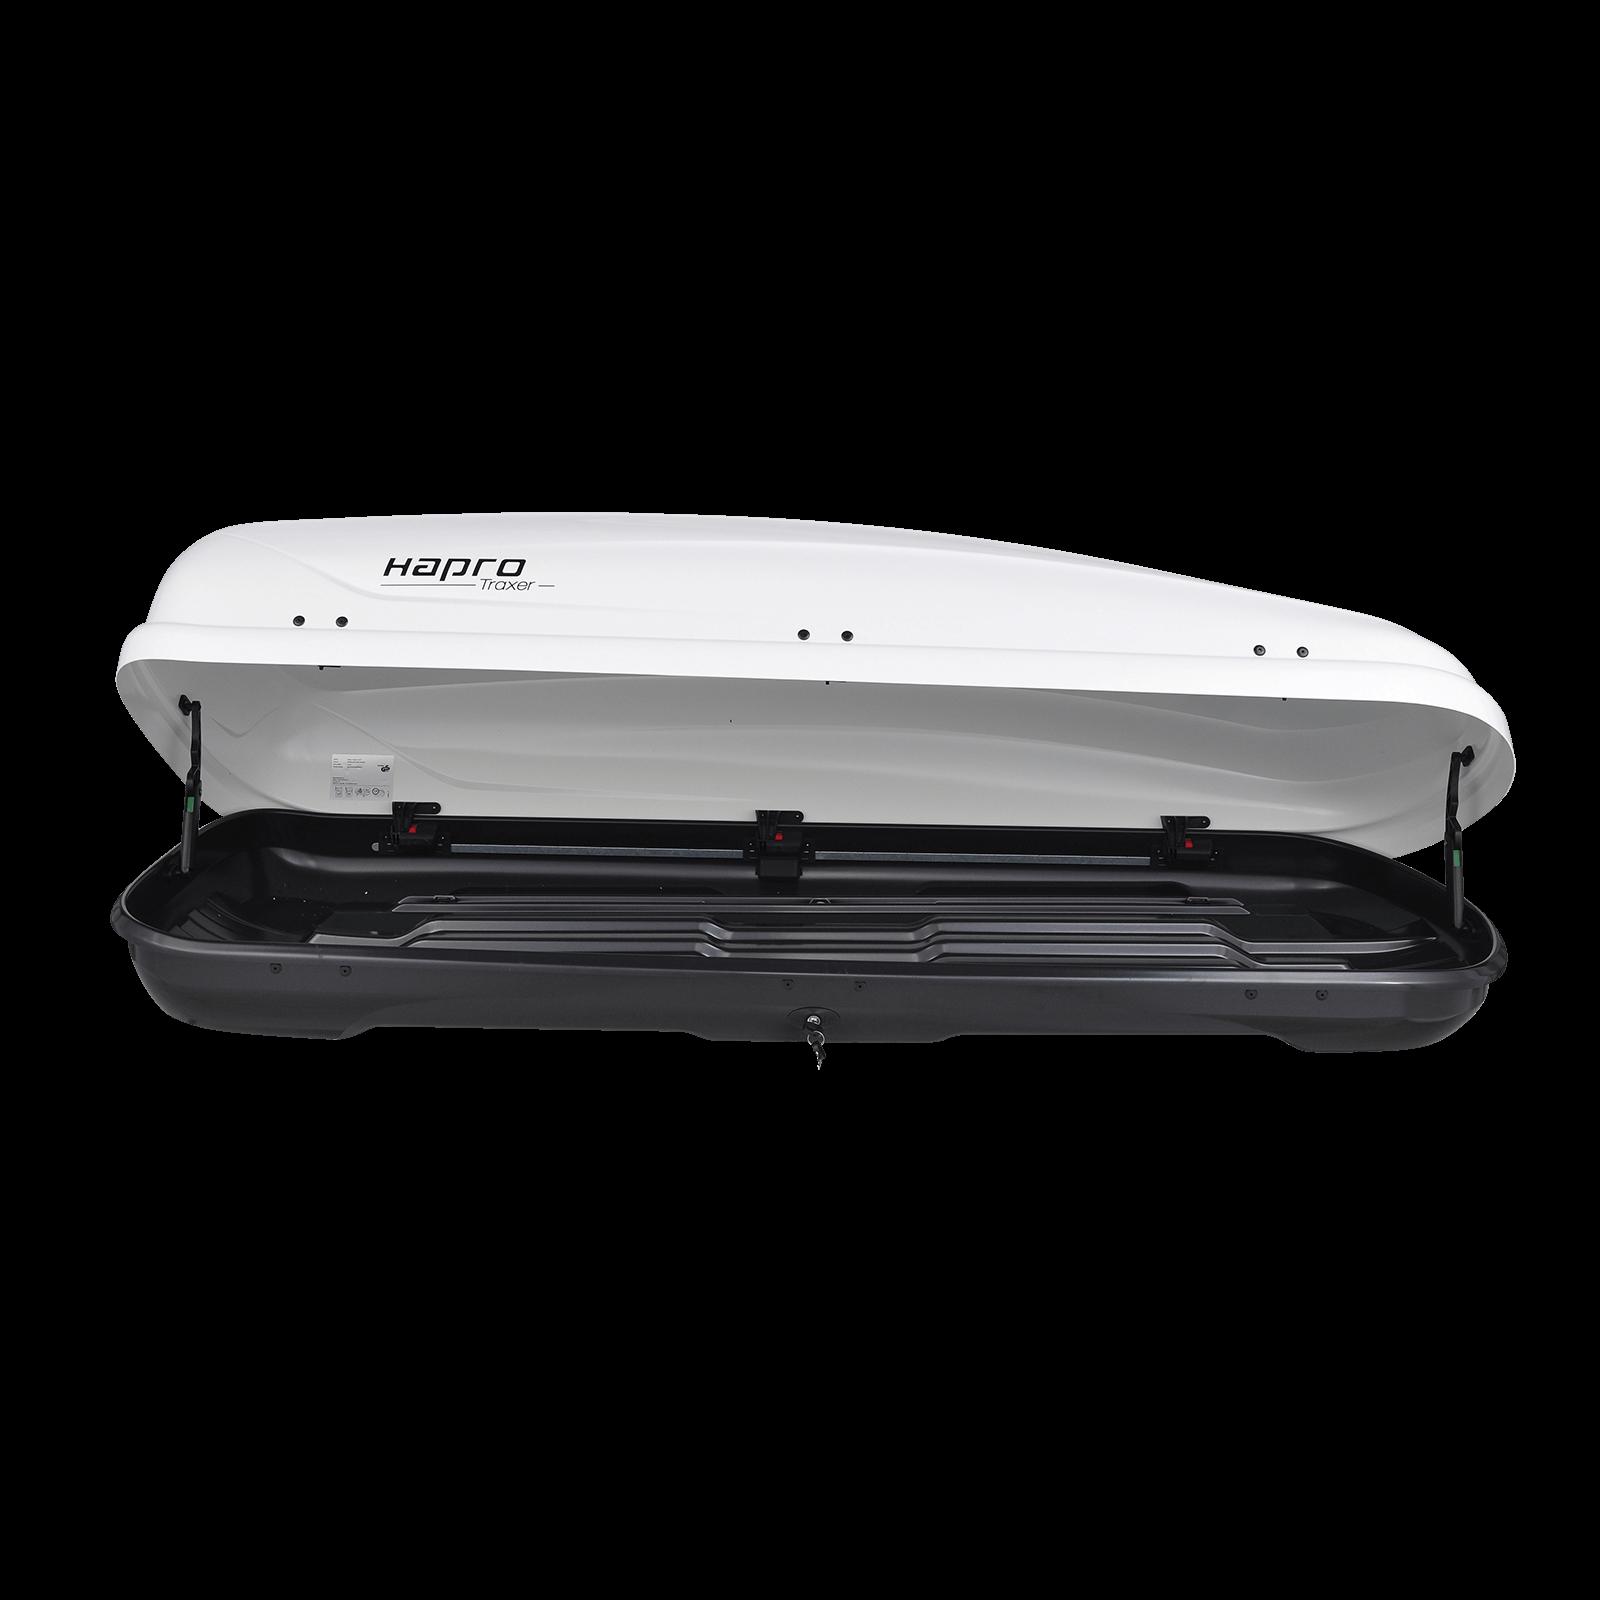 Dachbox Hapro Traxer 6.6 weiß - Bild 2